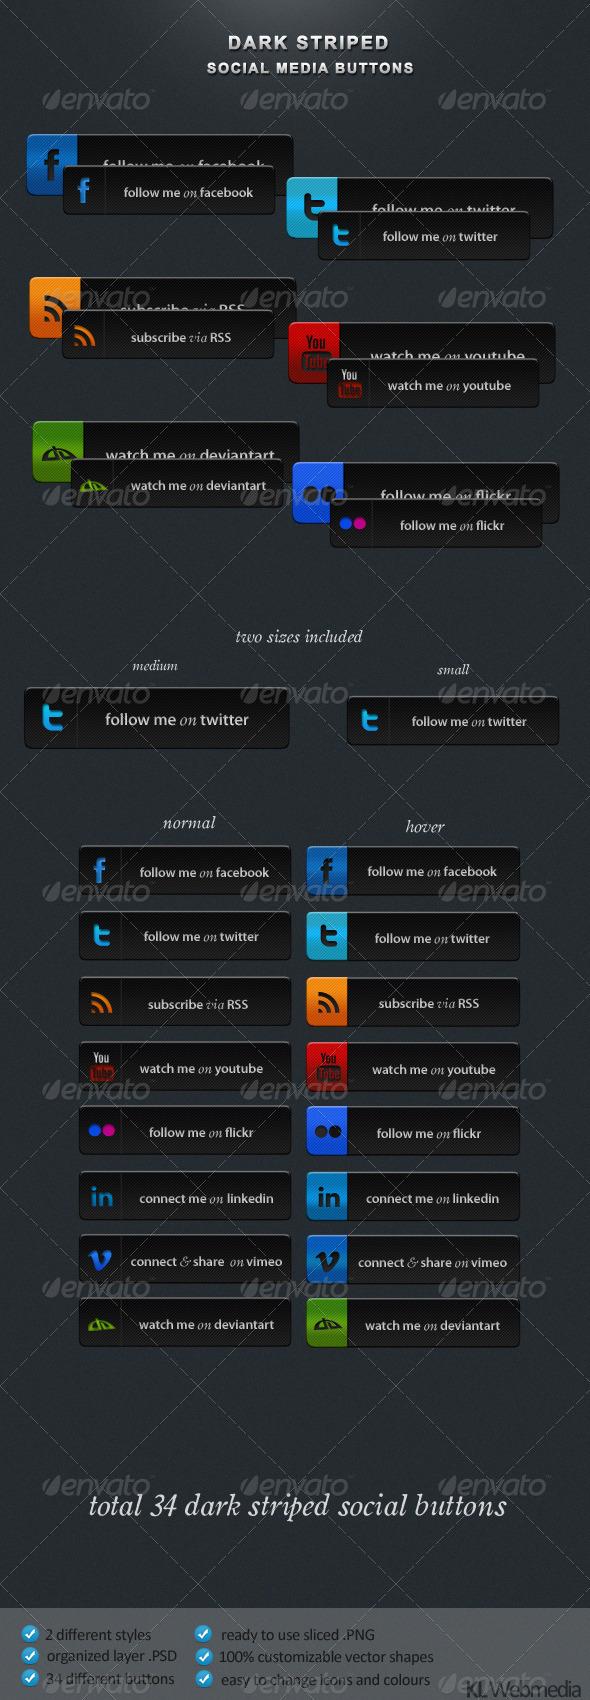 Dark Striped Social Buttons by KL-Webmedia